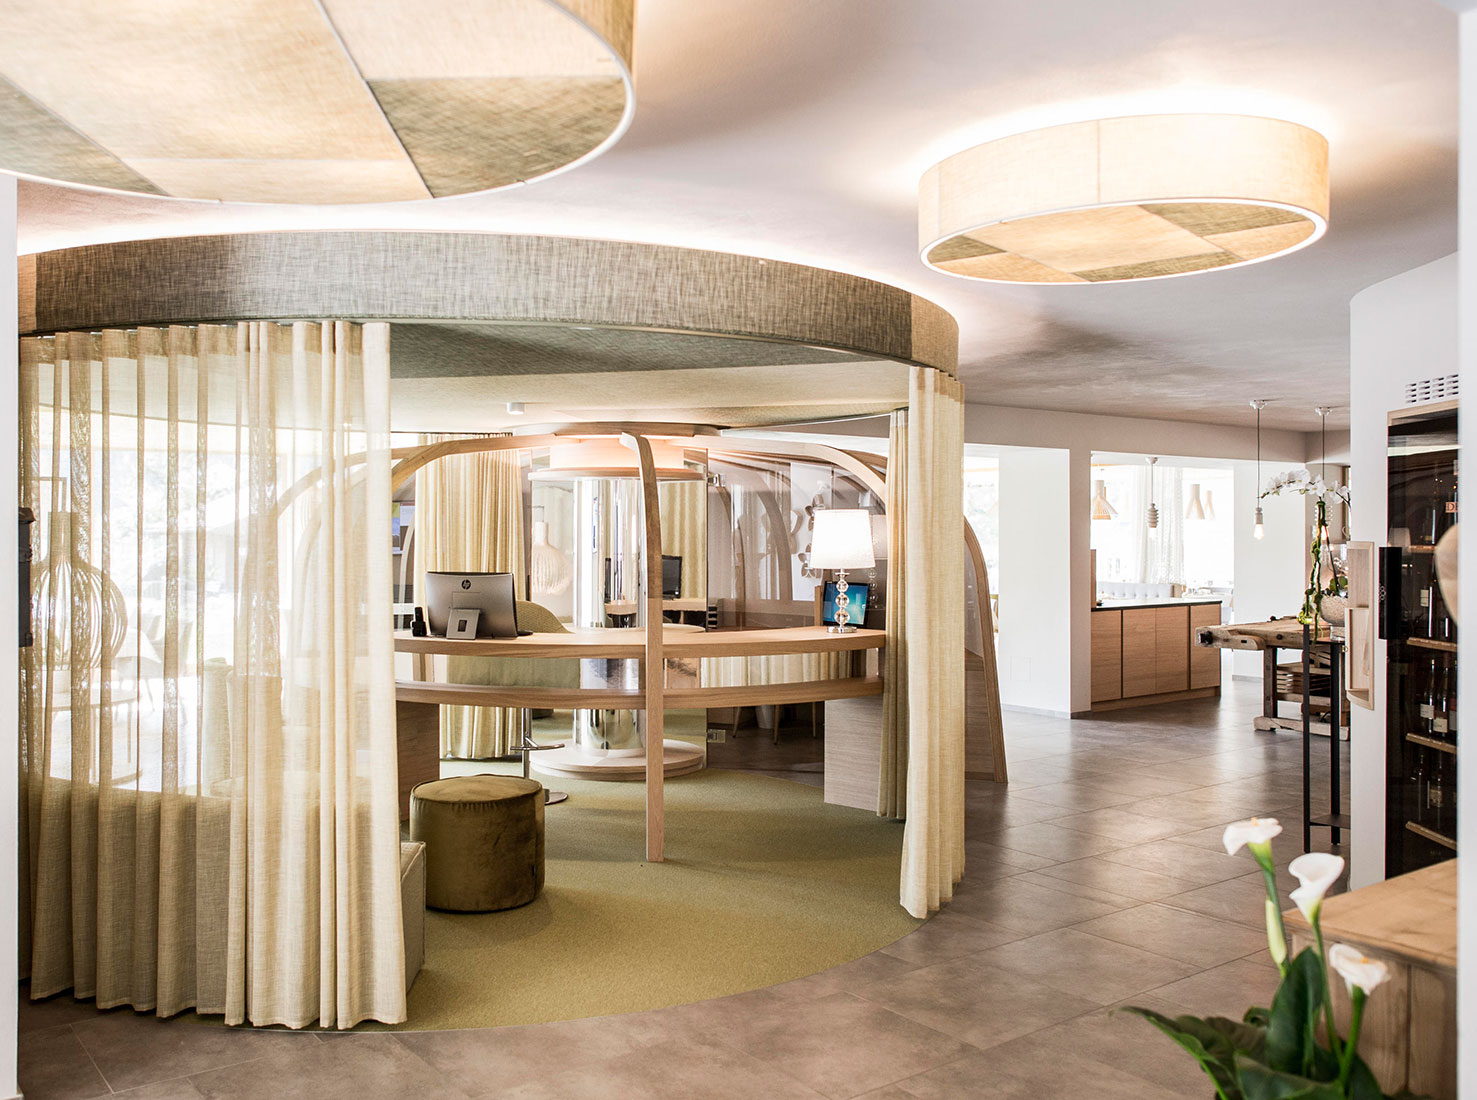 Apfelhotel Torgglerhof фото